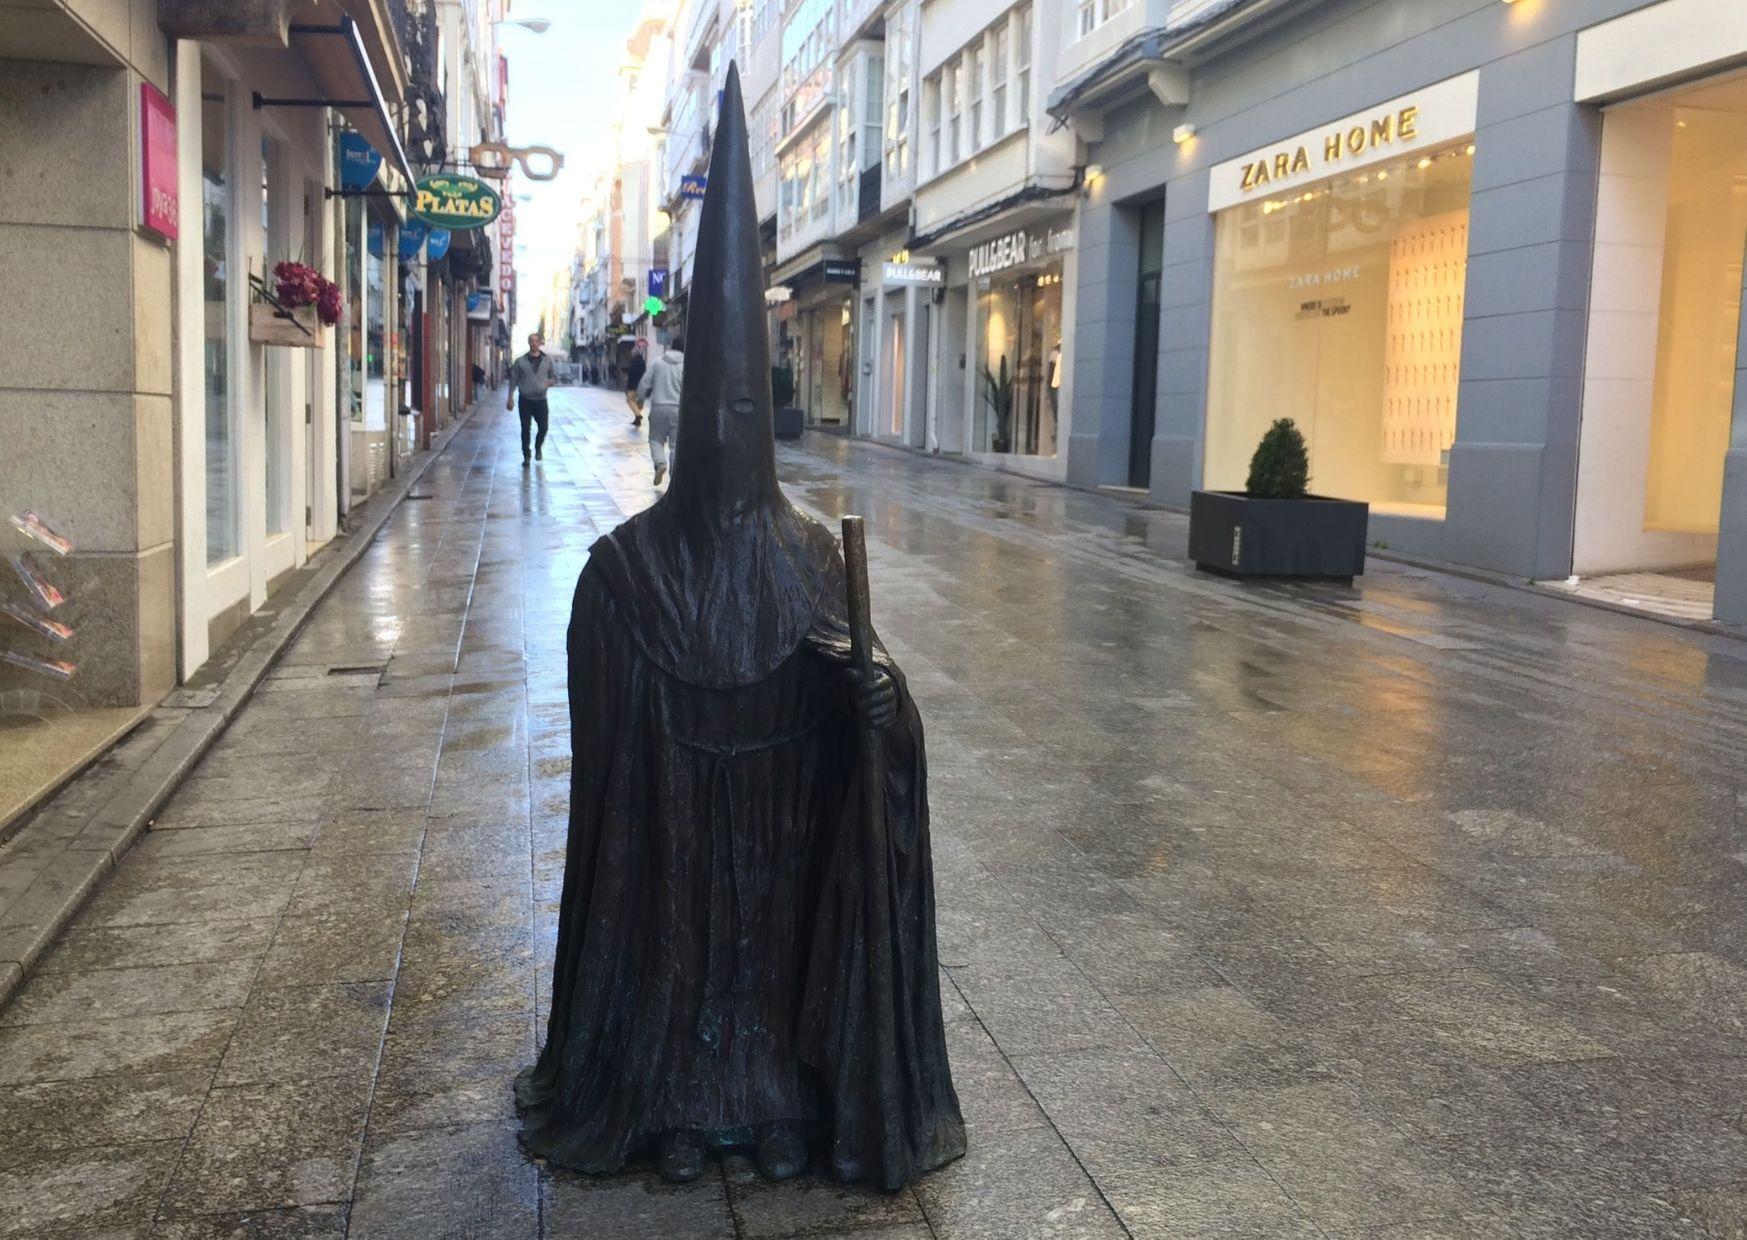 Semana Santa in Ferrol